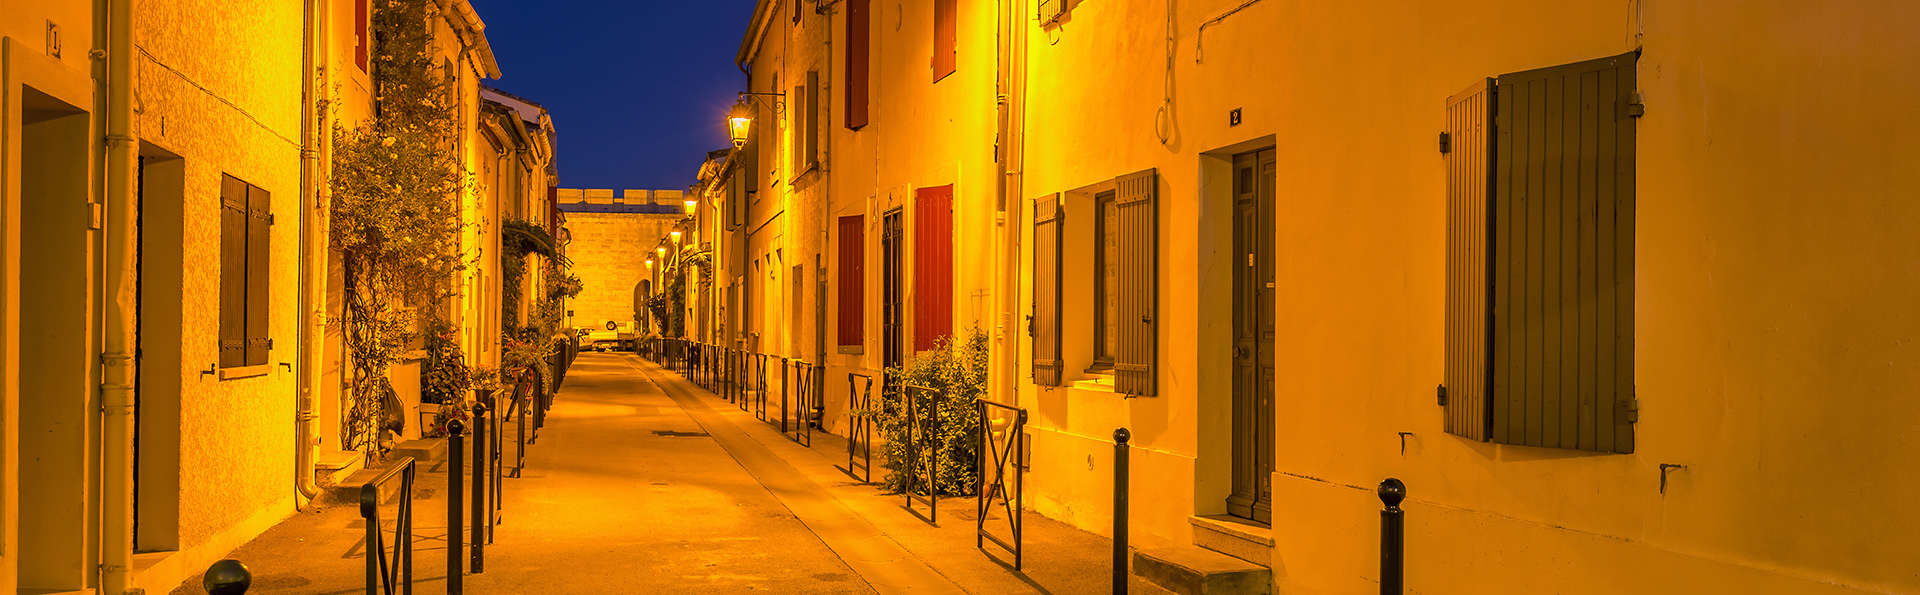 Villa Mazarin Aigues Mortes - Edit_AiguesMortes4.jpg